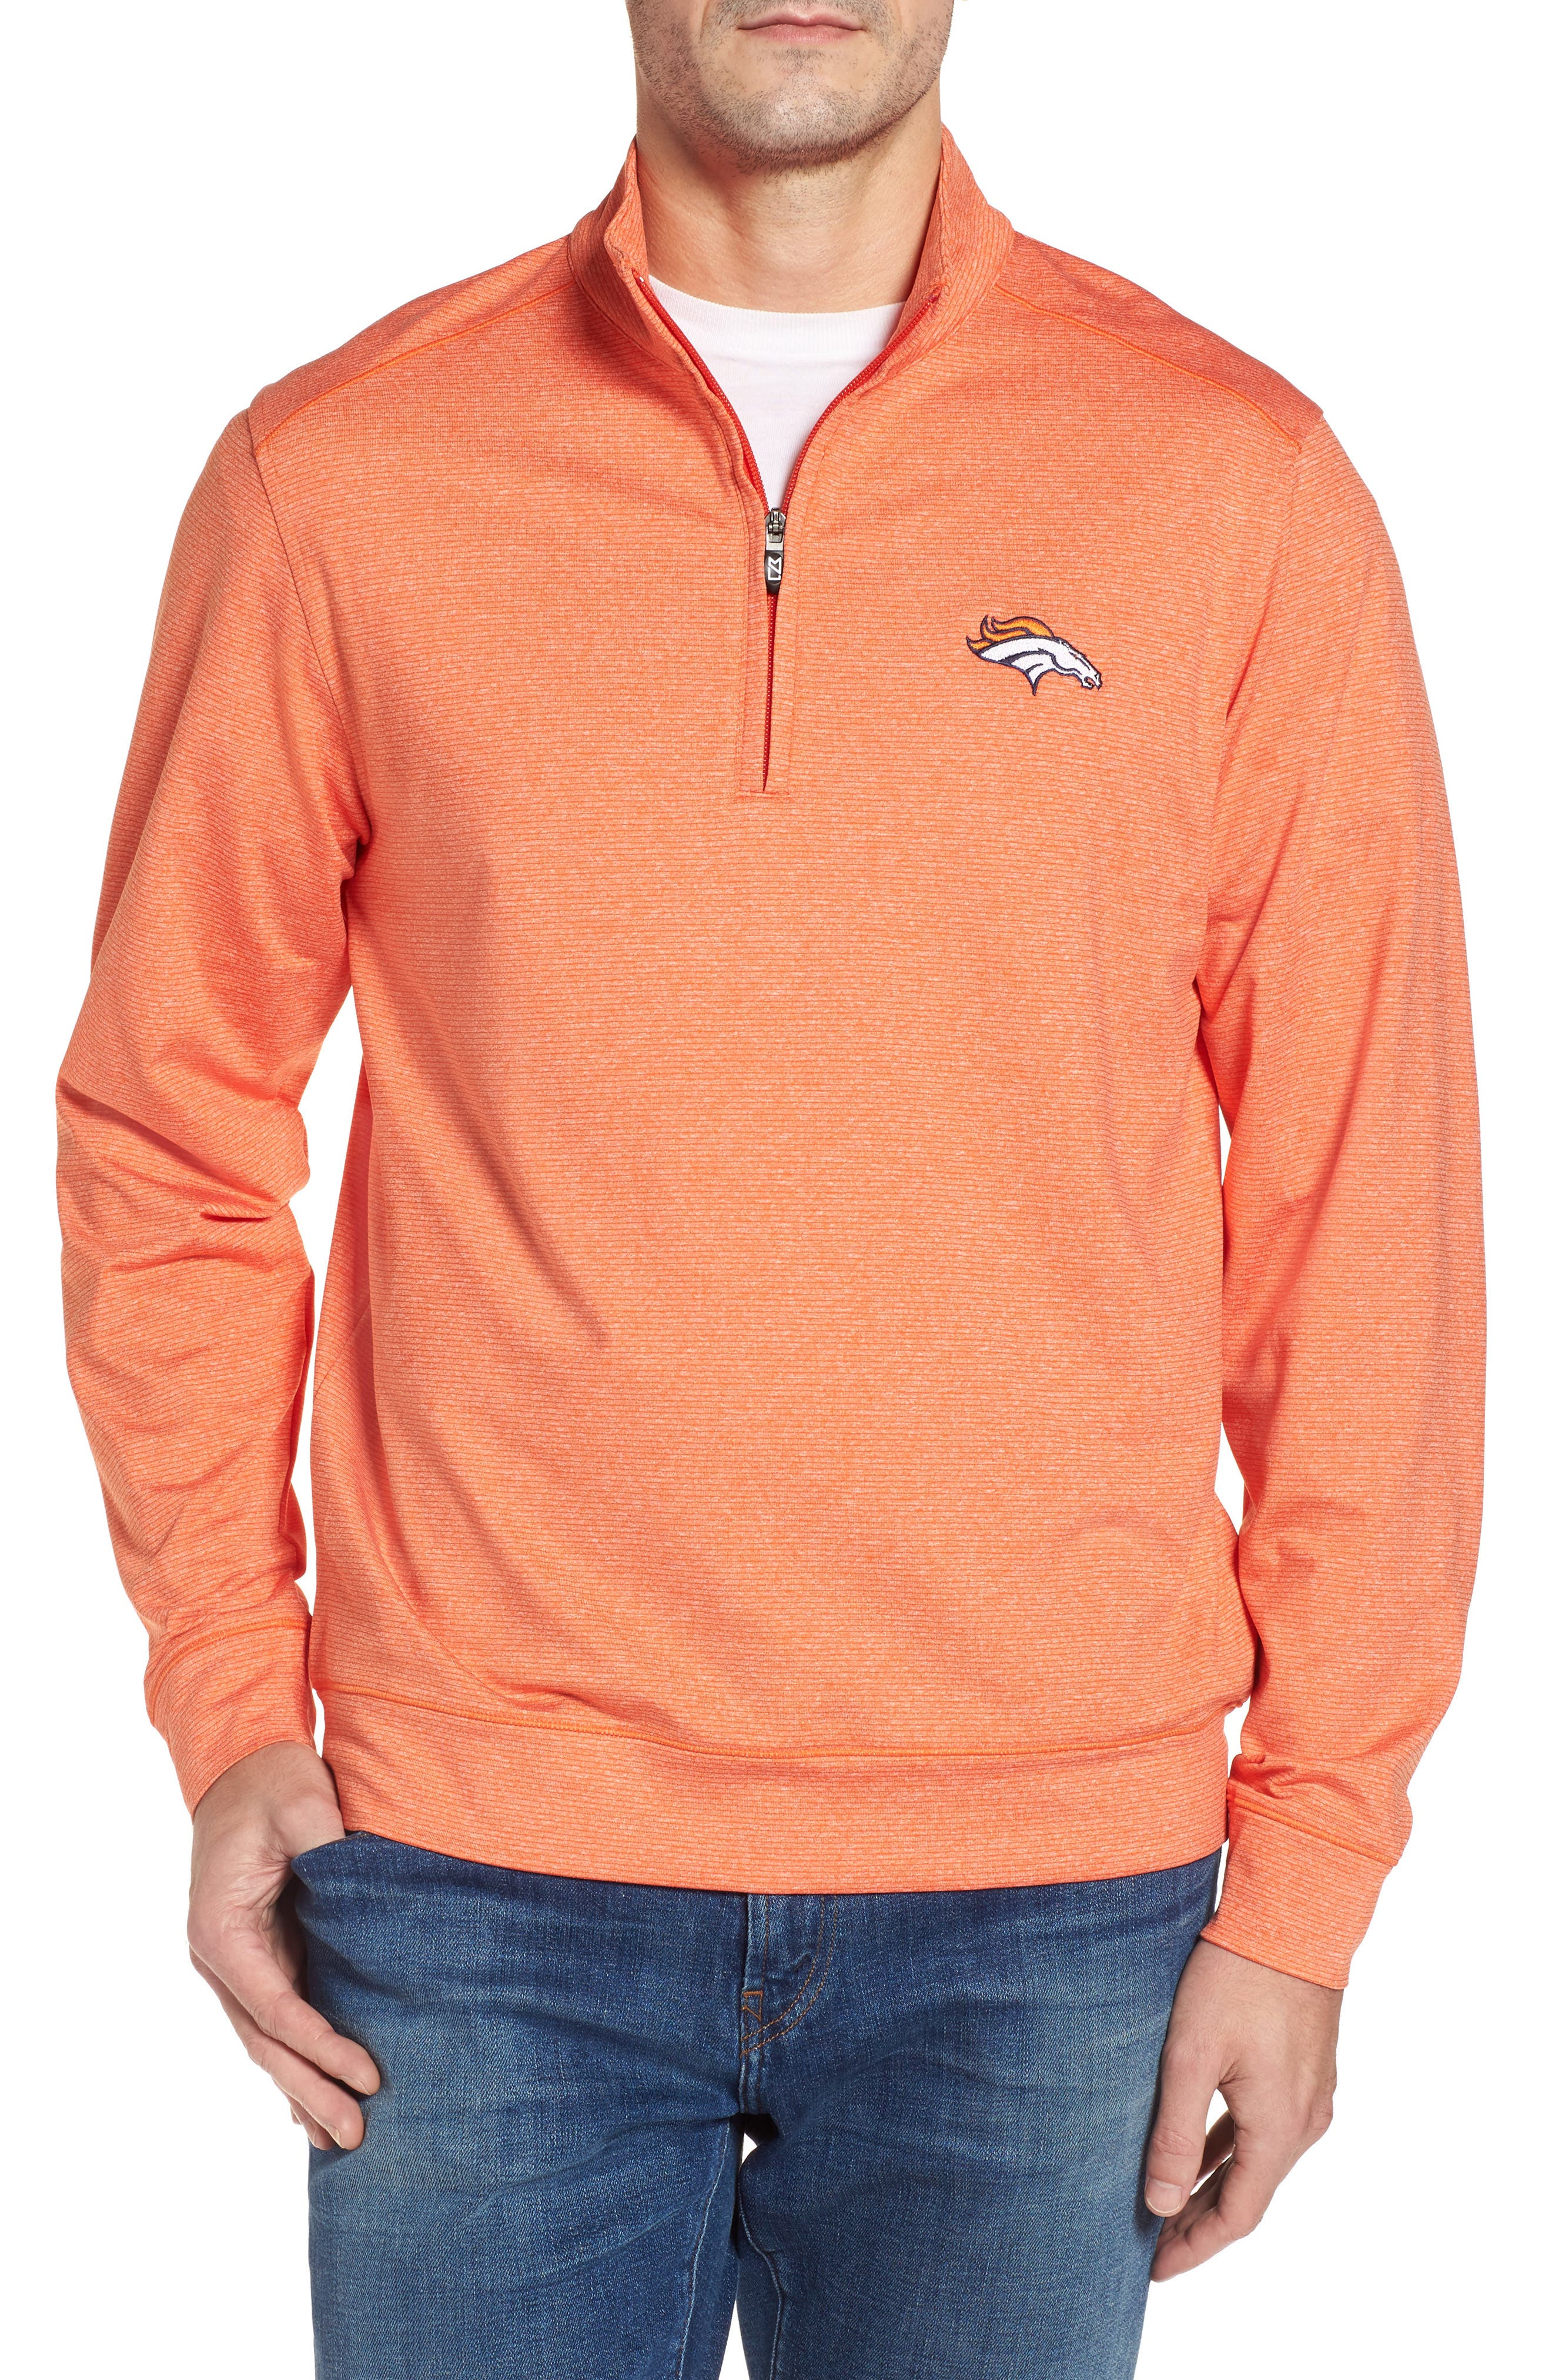 Main Image - Cutter & Buck Shoreline - Denver Broncos Half Zip Pullover